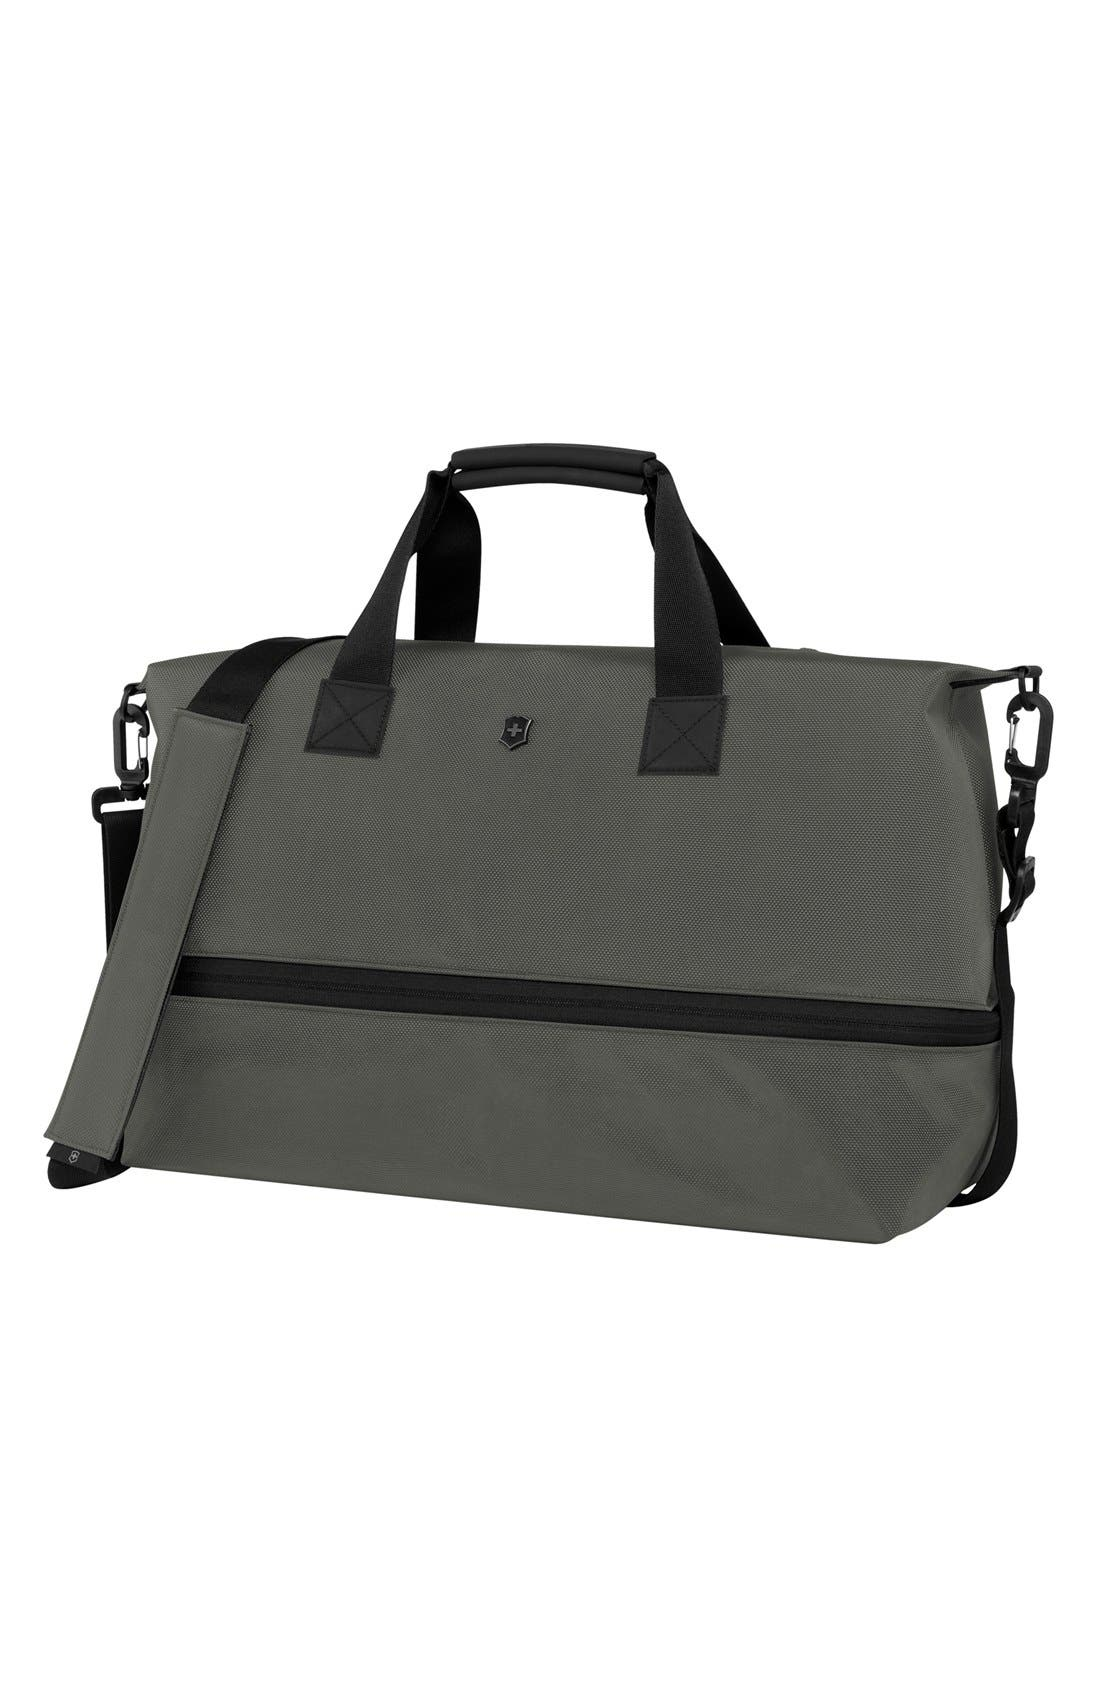 Main Image - Victorinox Swiss Army® Duffel Bag